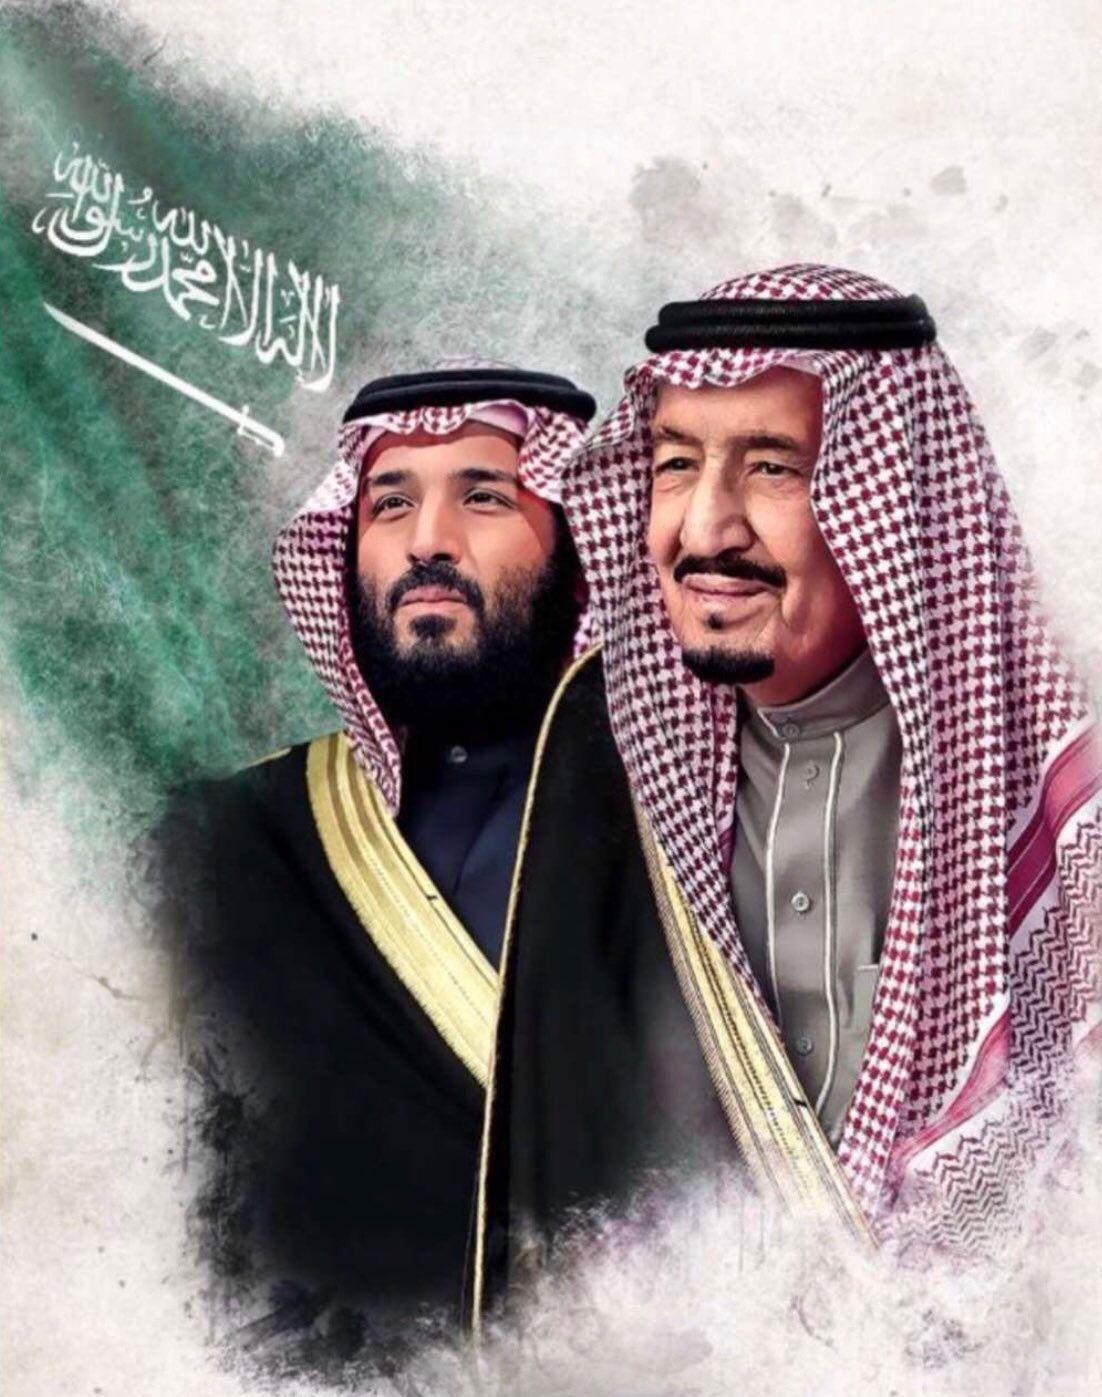 Pin By Toha On دام عزك ياوطن Saudi Arabia Flag Ksa Saudi Arabia National Day Saudi